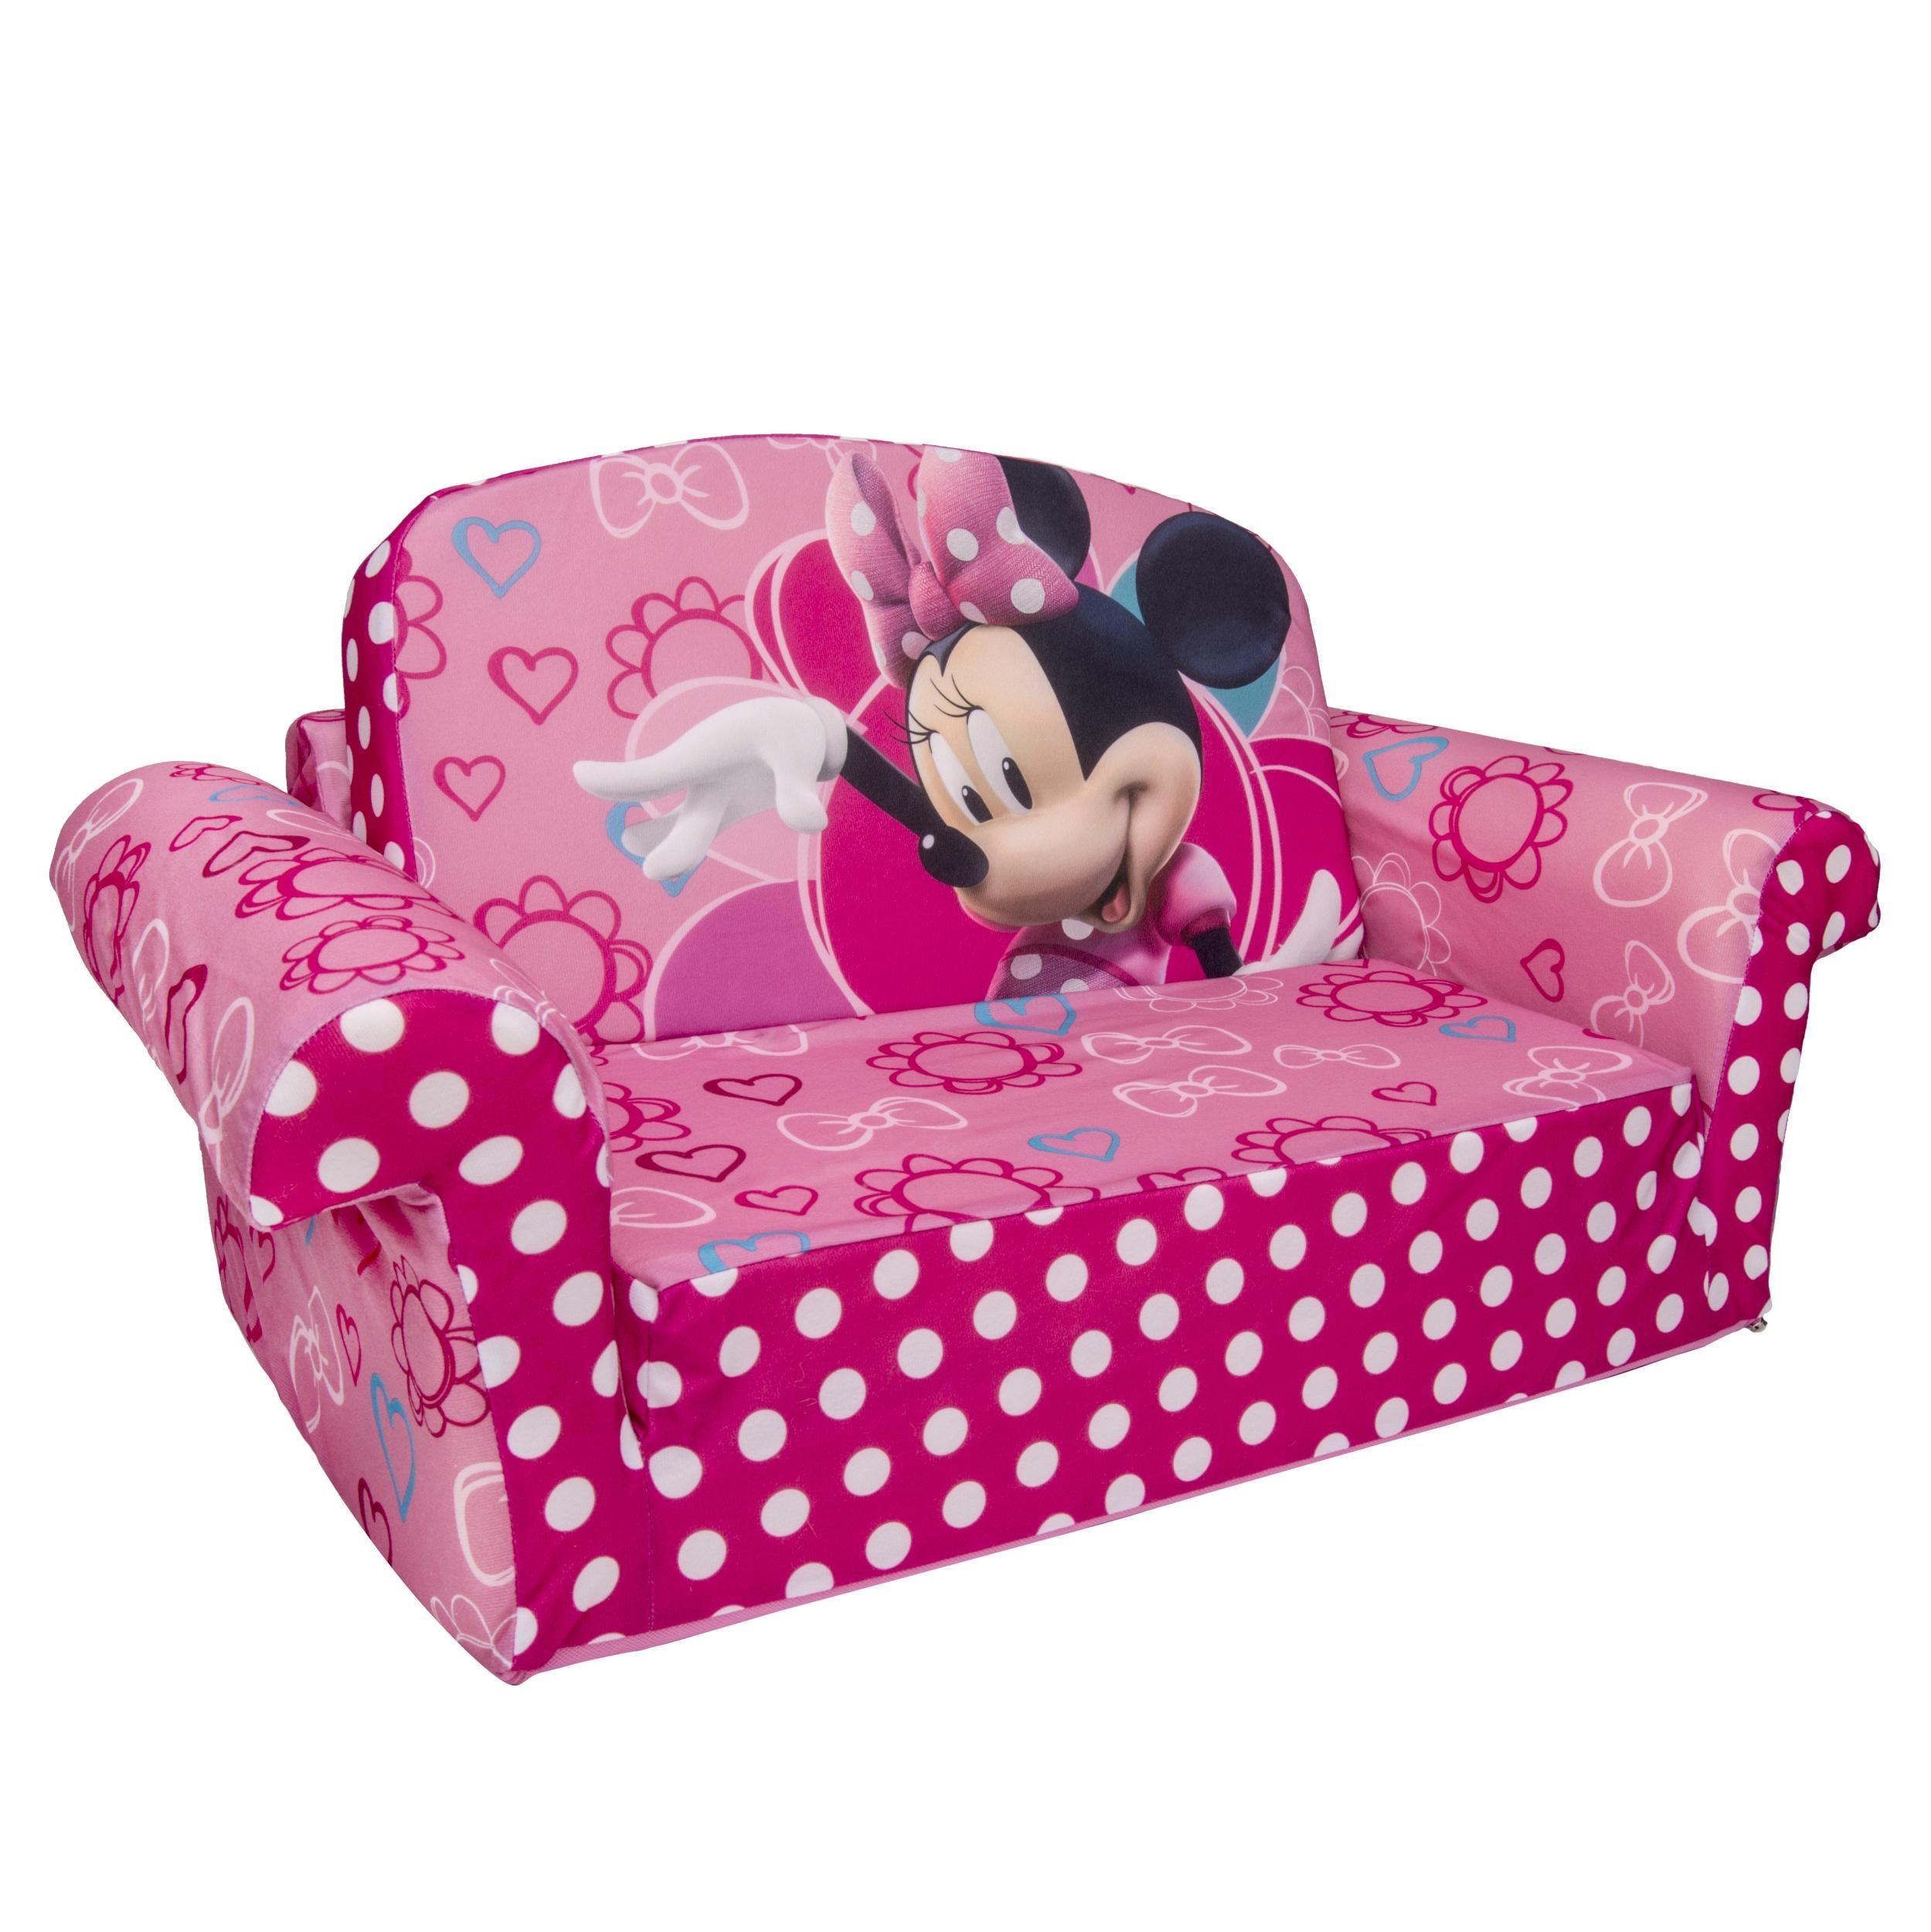 Sofas Center : Spin Master Marshmallow Furniture Flippen Sofa Pertaining To Disney Princess Couches (Image 17 of 20)